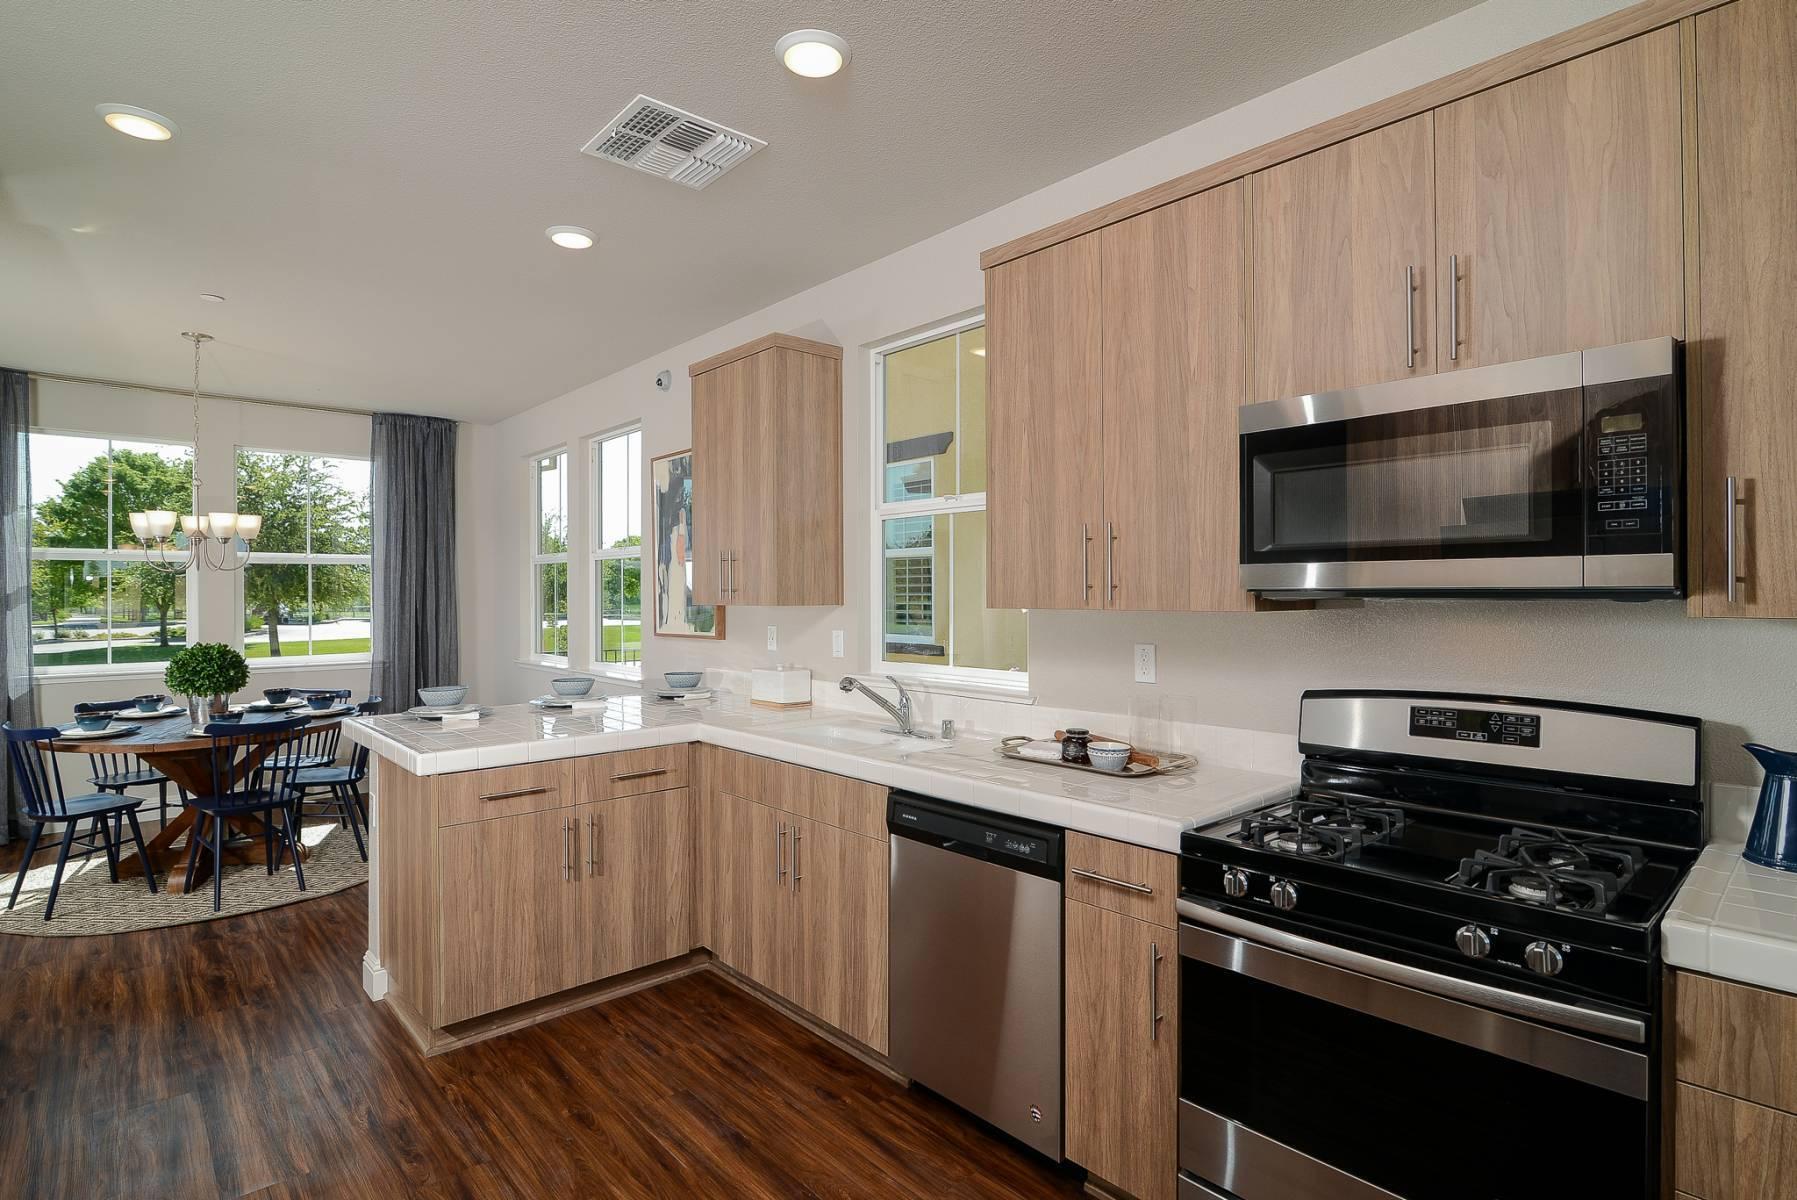 Kitchen featured in The Viaggio By Elliott Homes in Sacramento, CA